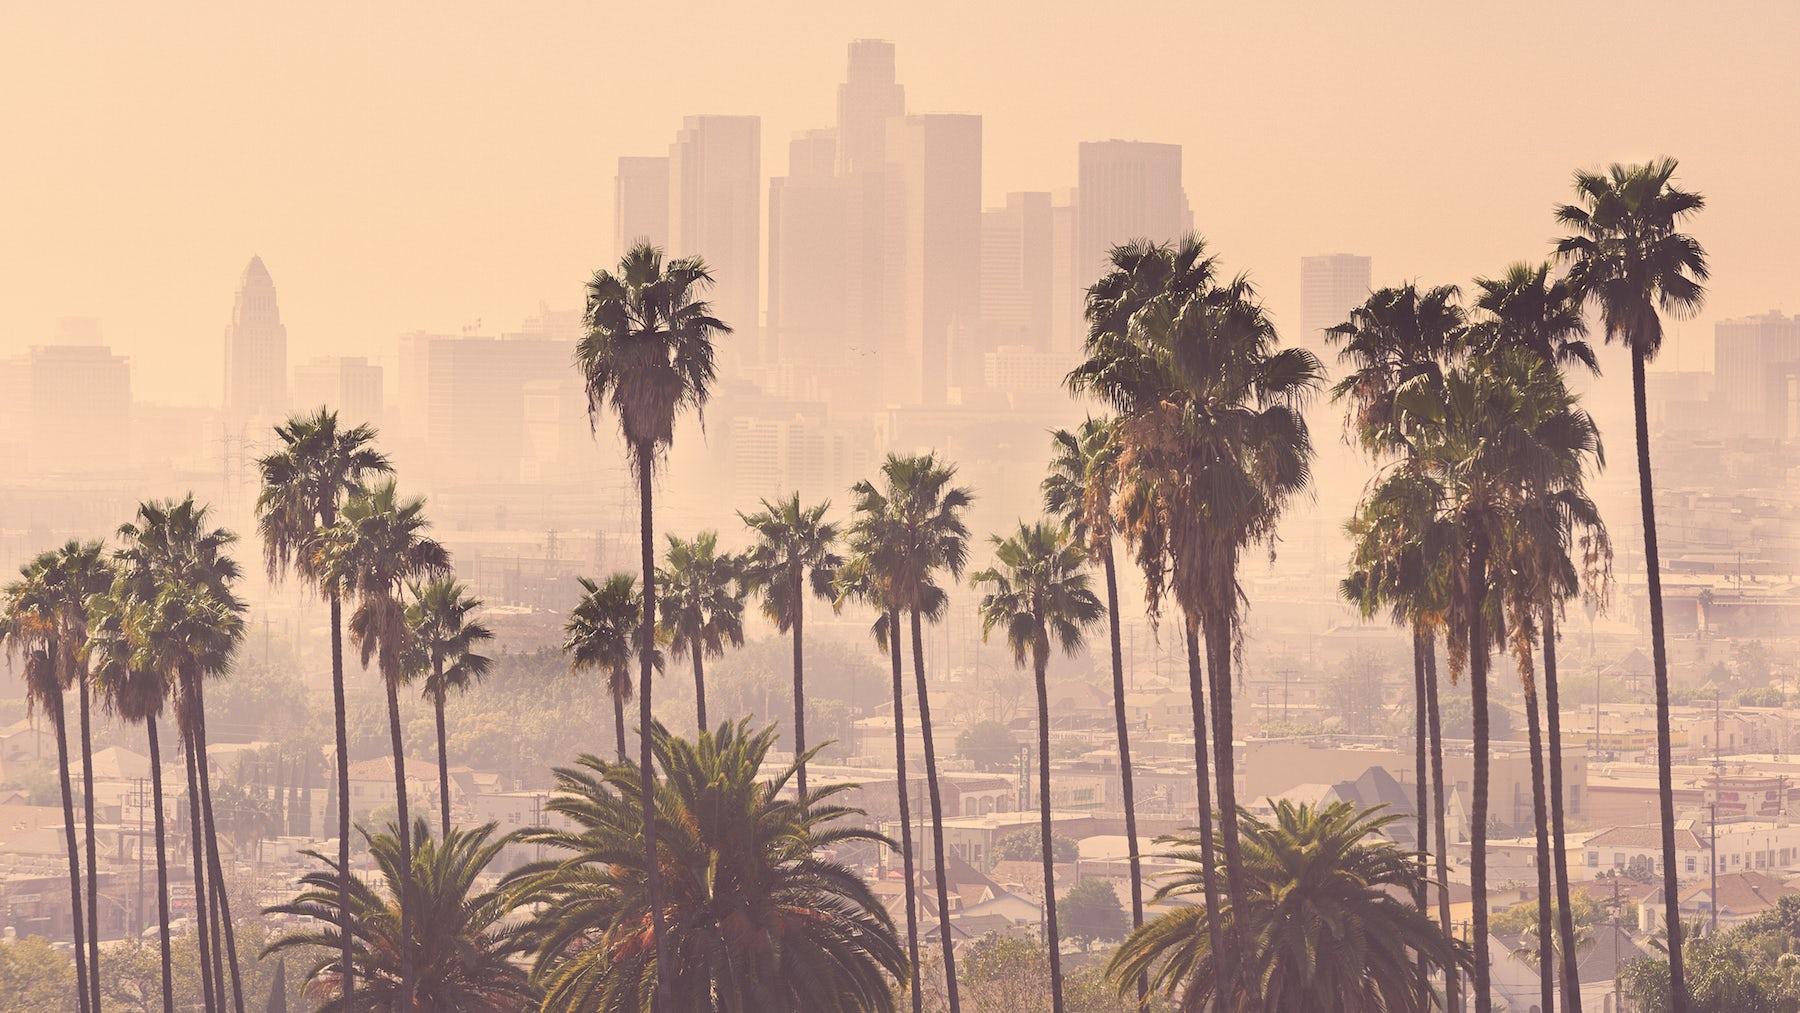 Los Angeles | Source: Shutterstock